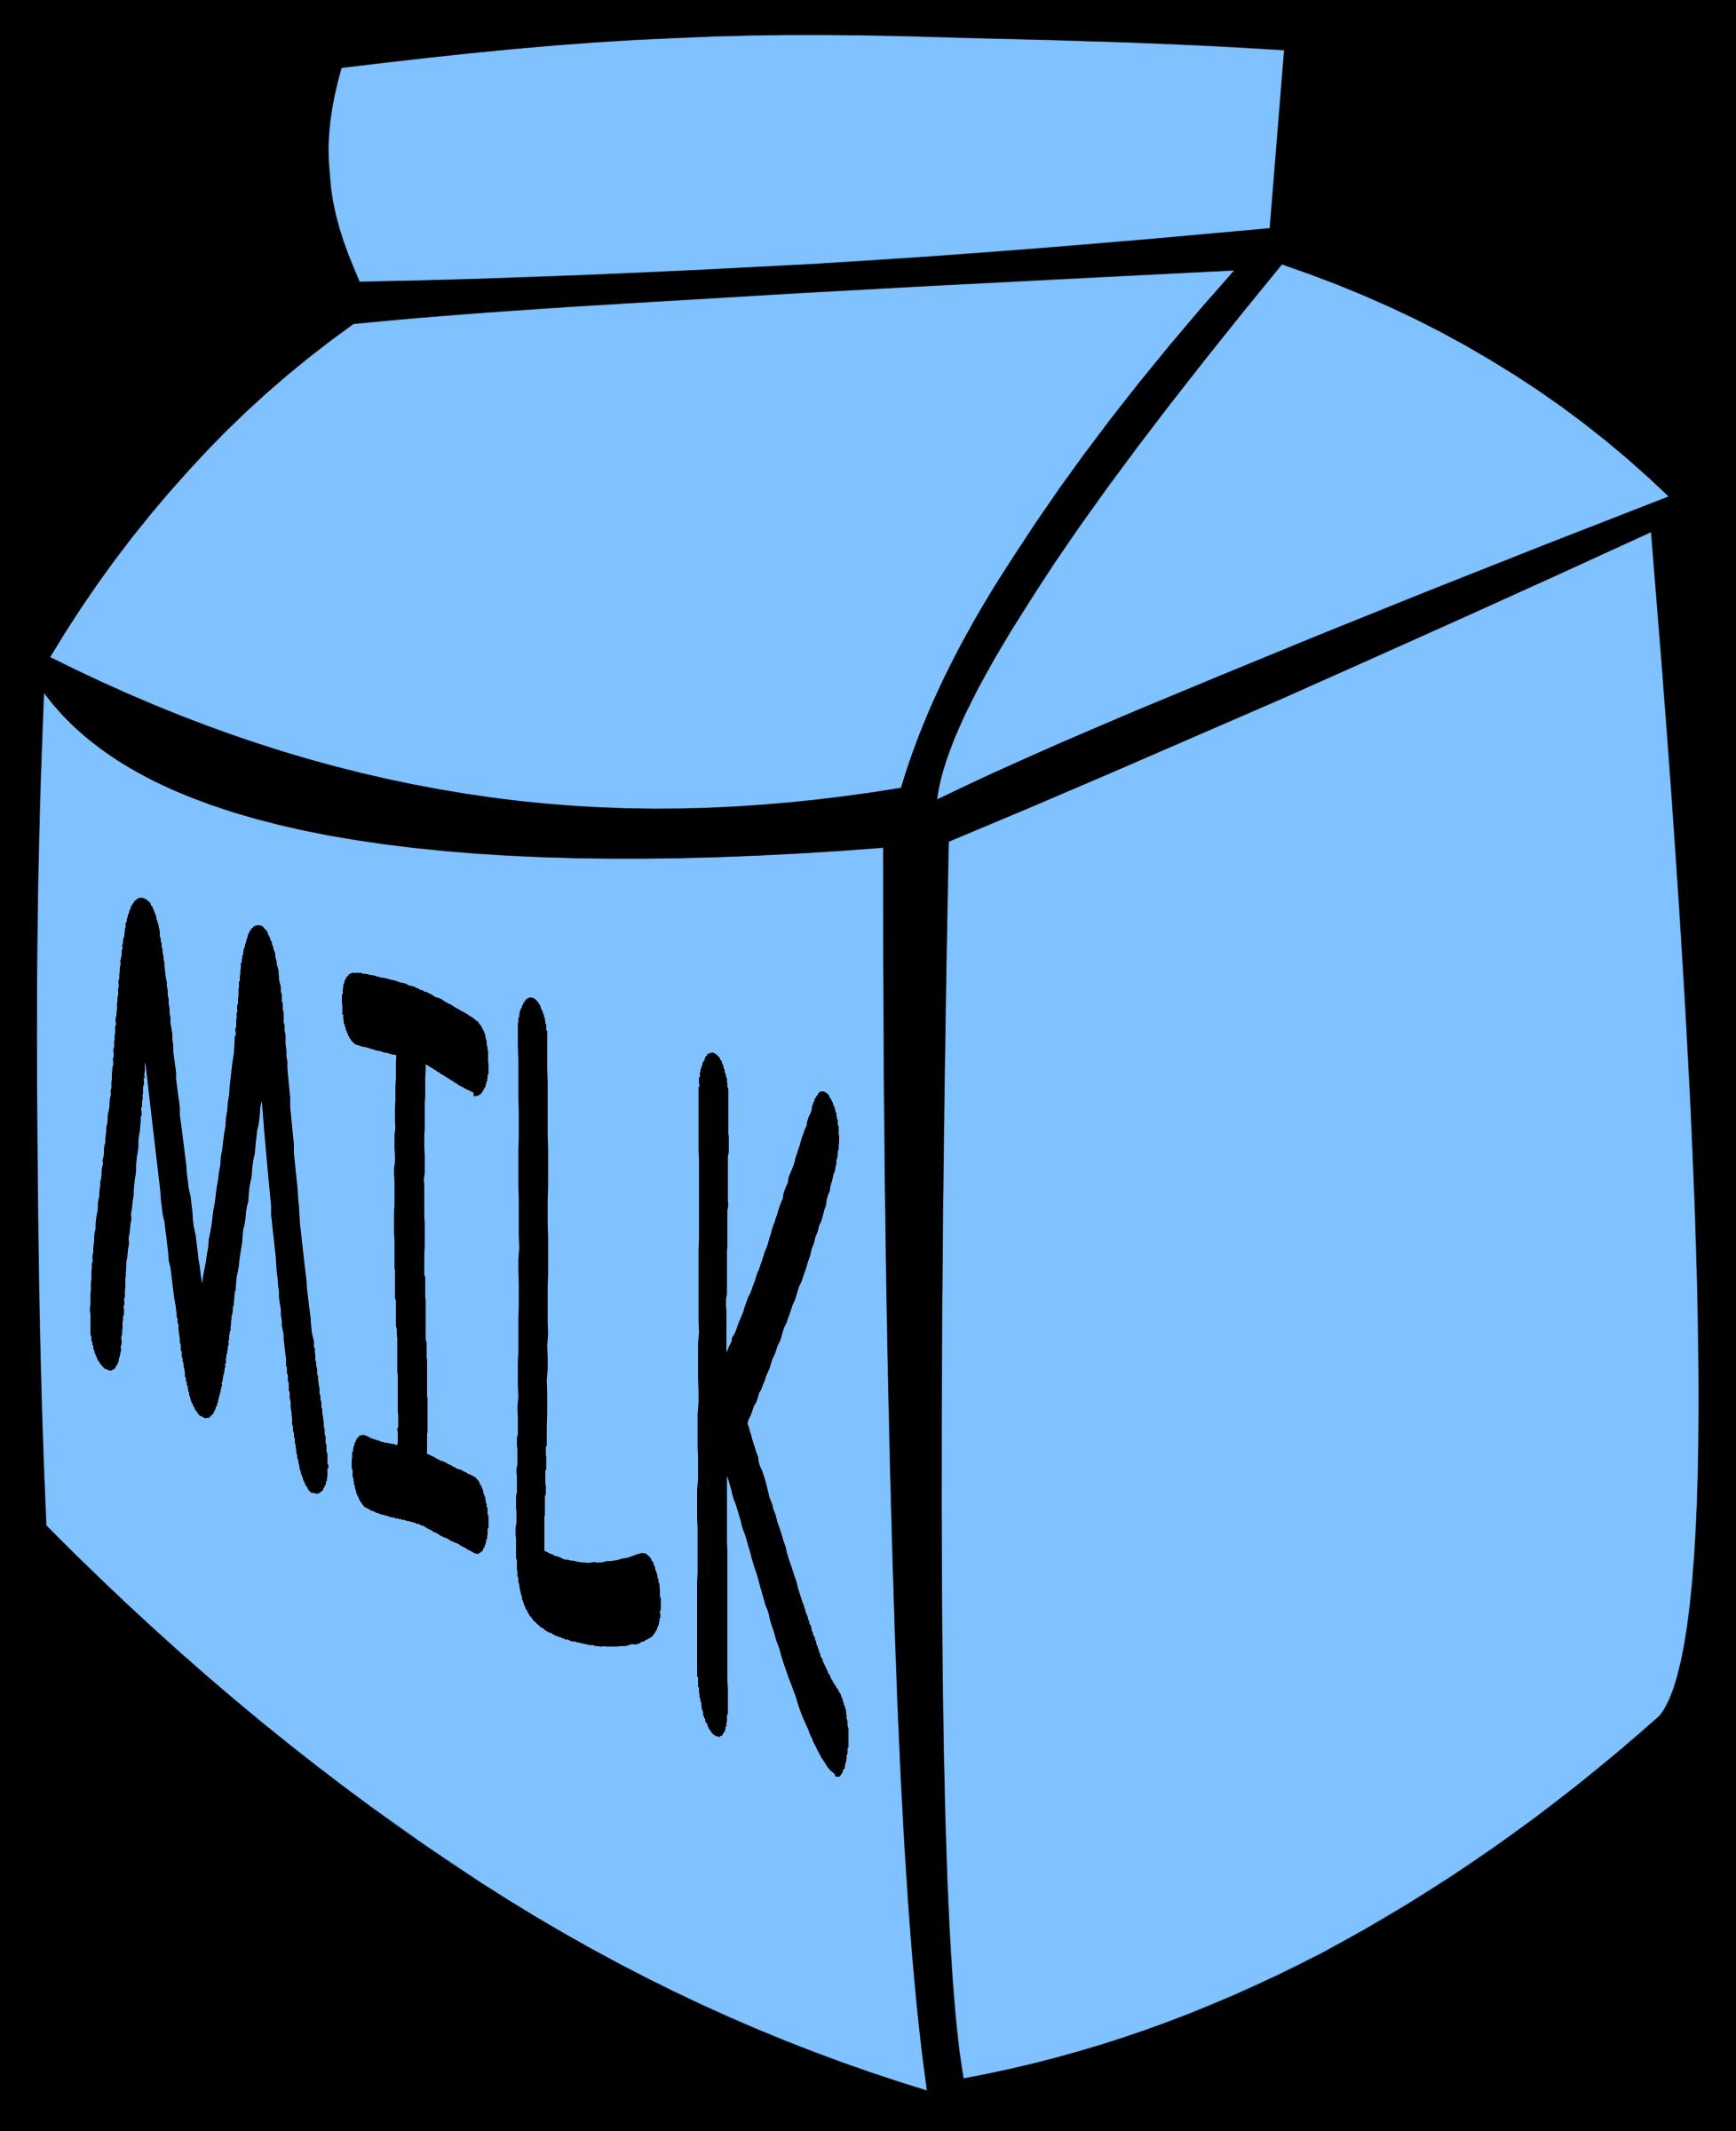 Drinks clipart milk drink. Fast food big image